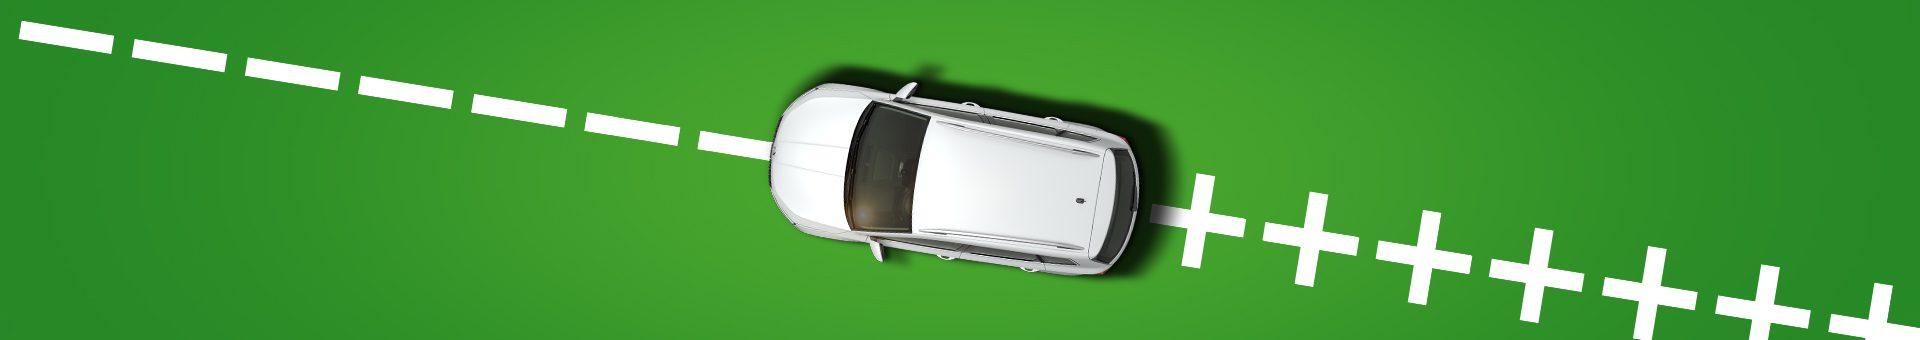 ŠKODA Plus ojeté vozy